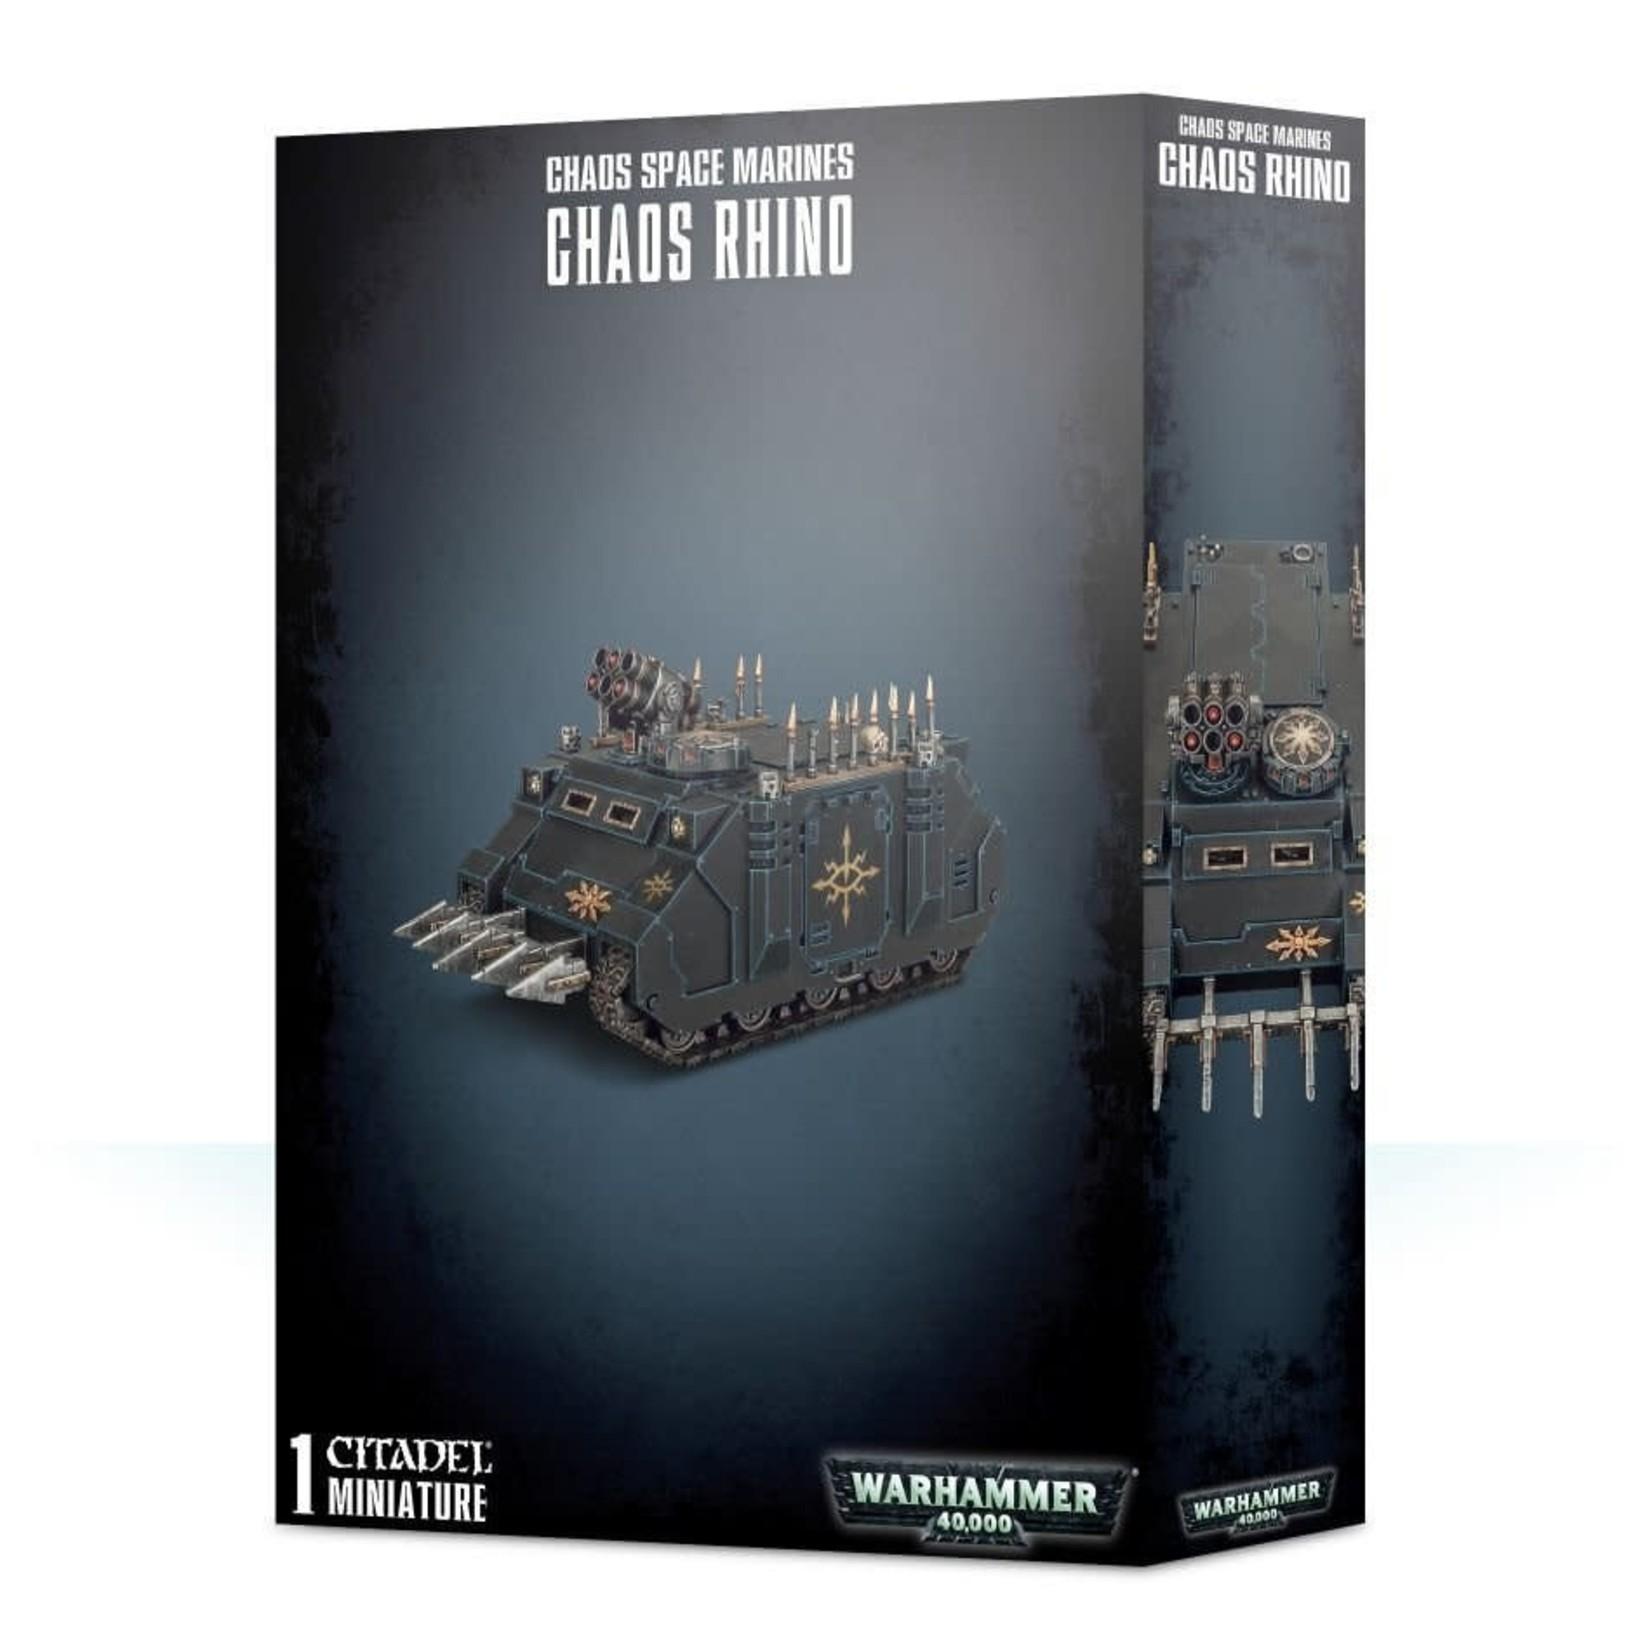 Games Workshop Warhammer 40k: Chaos Space Marines - Chaos Rhino